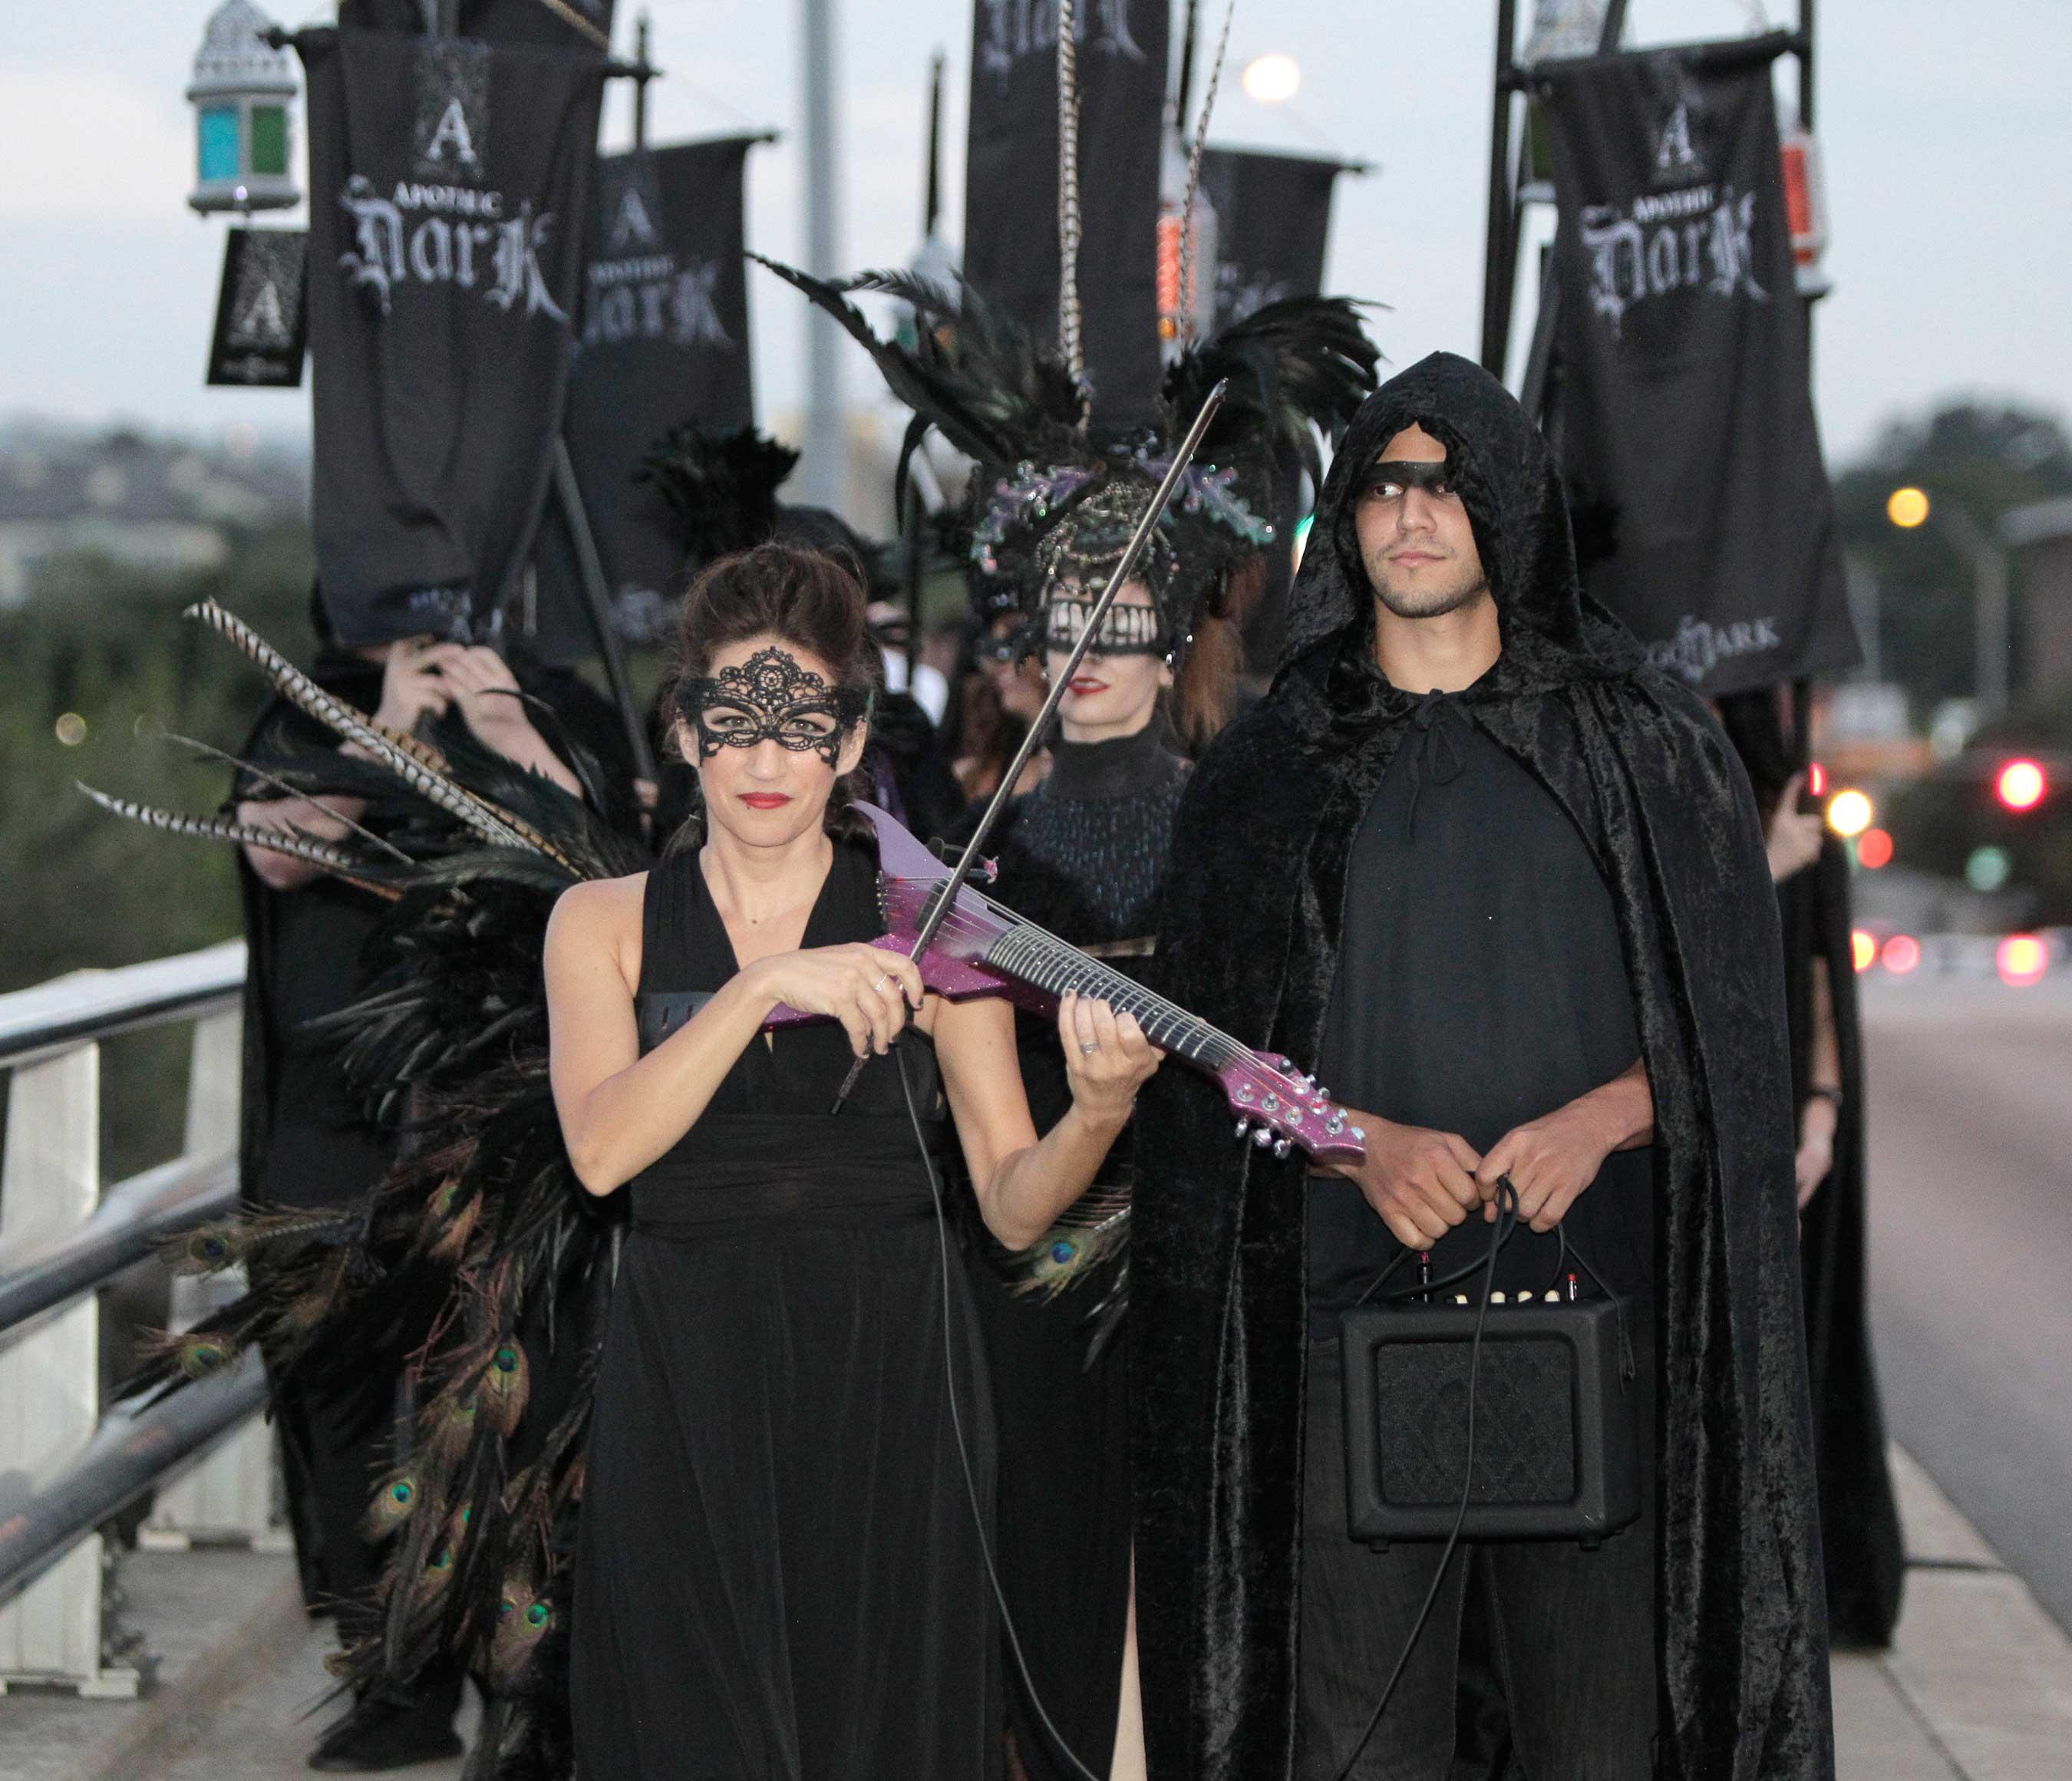 Procession on Bat Bridge